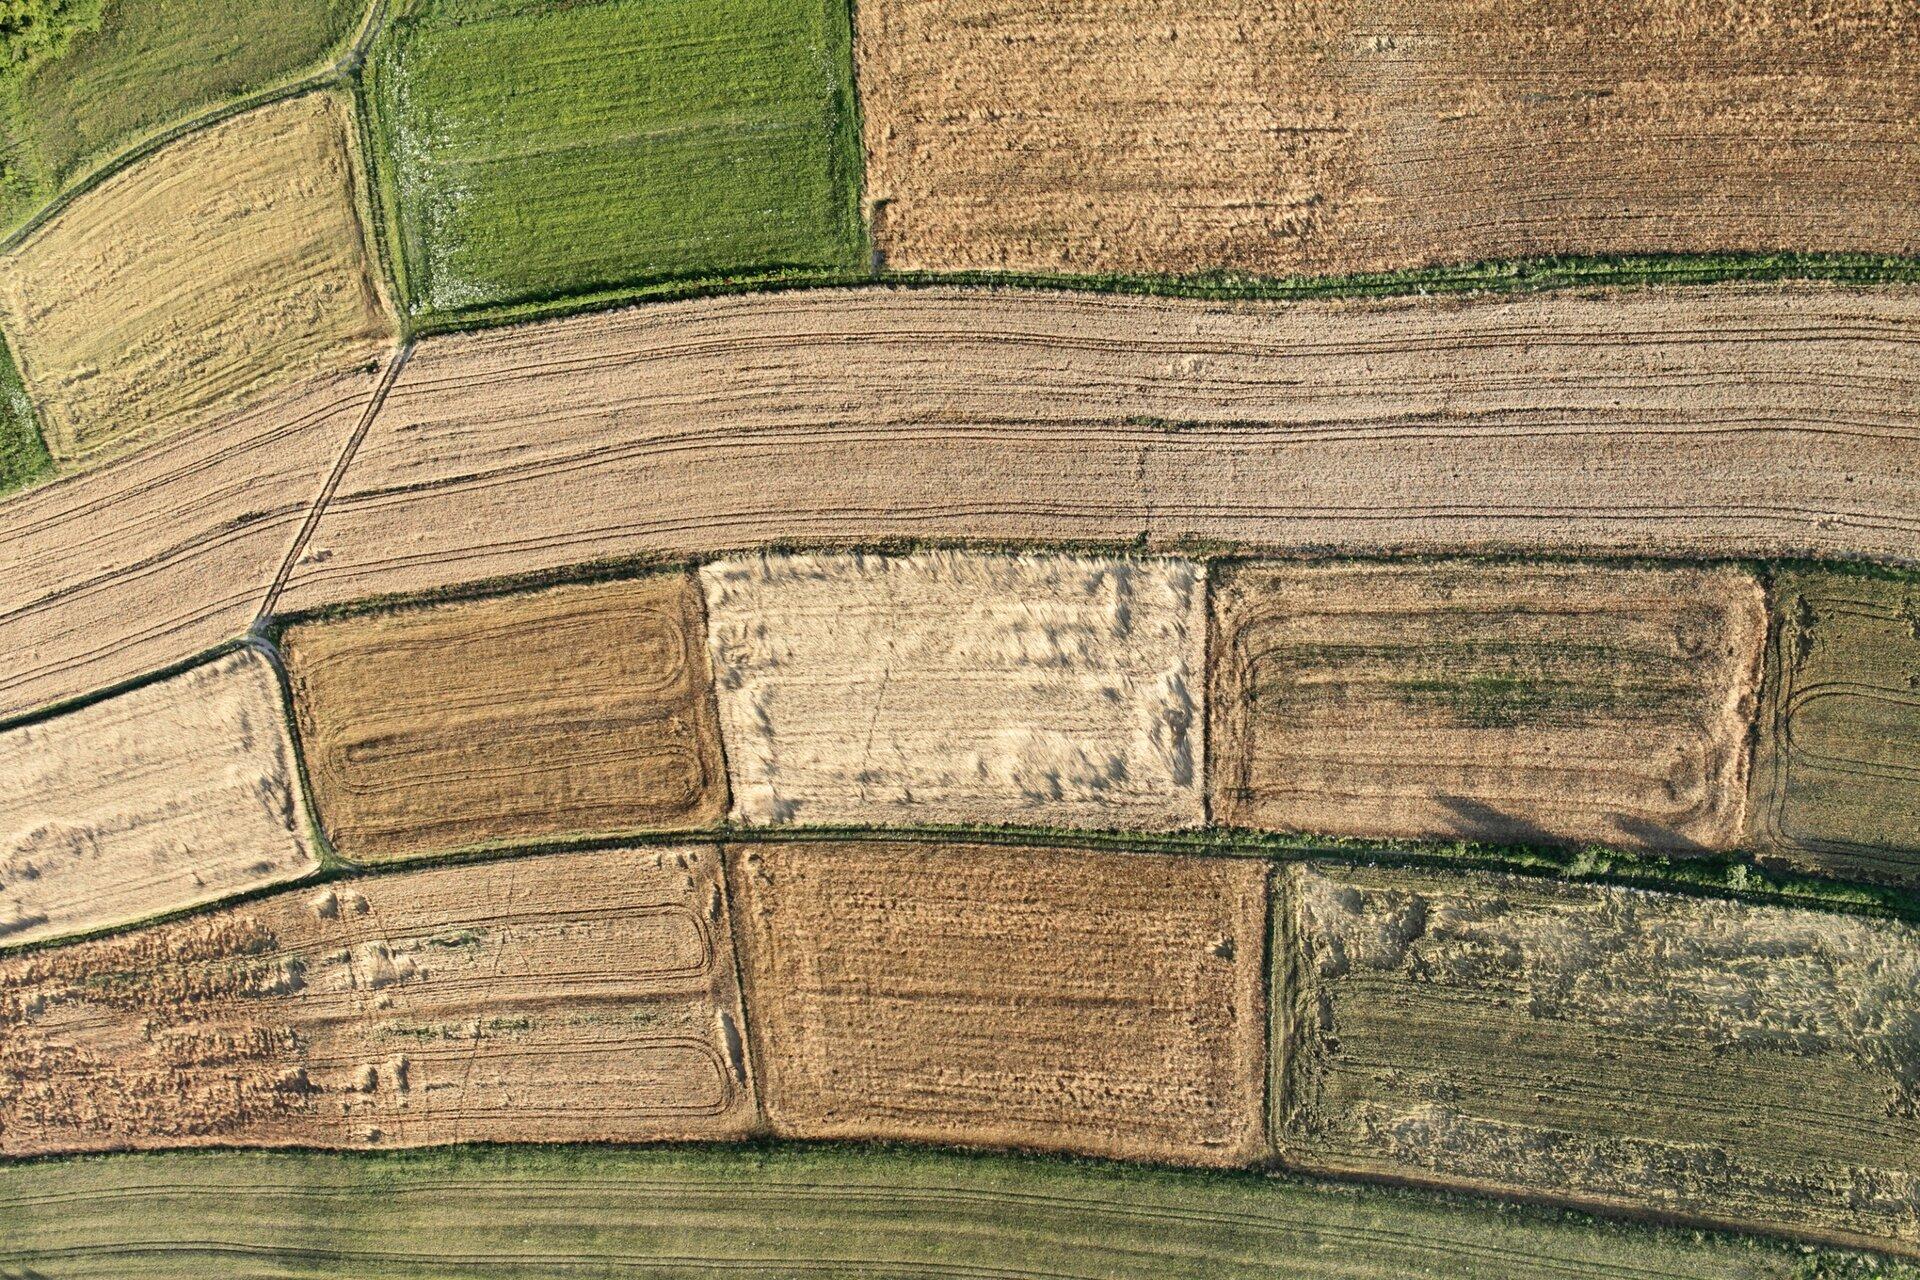 Rysunek pola uprawnego widzianego zsamolotu.